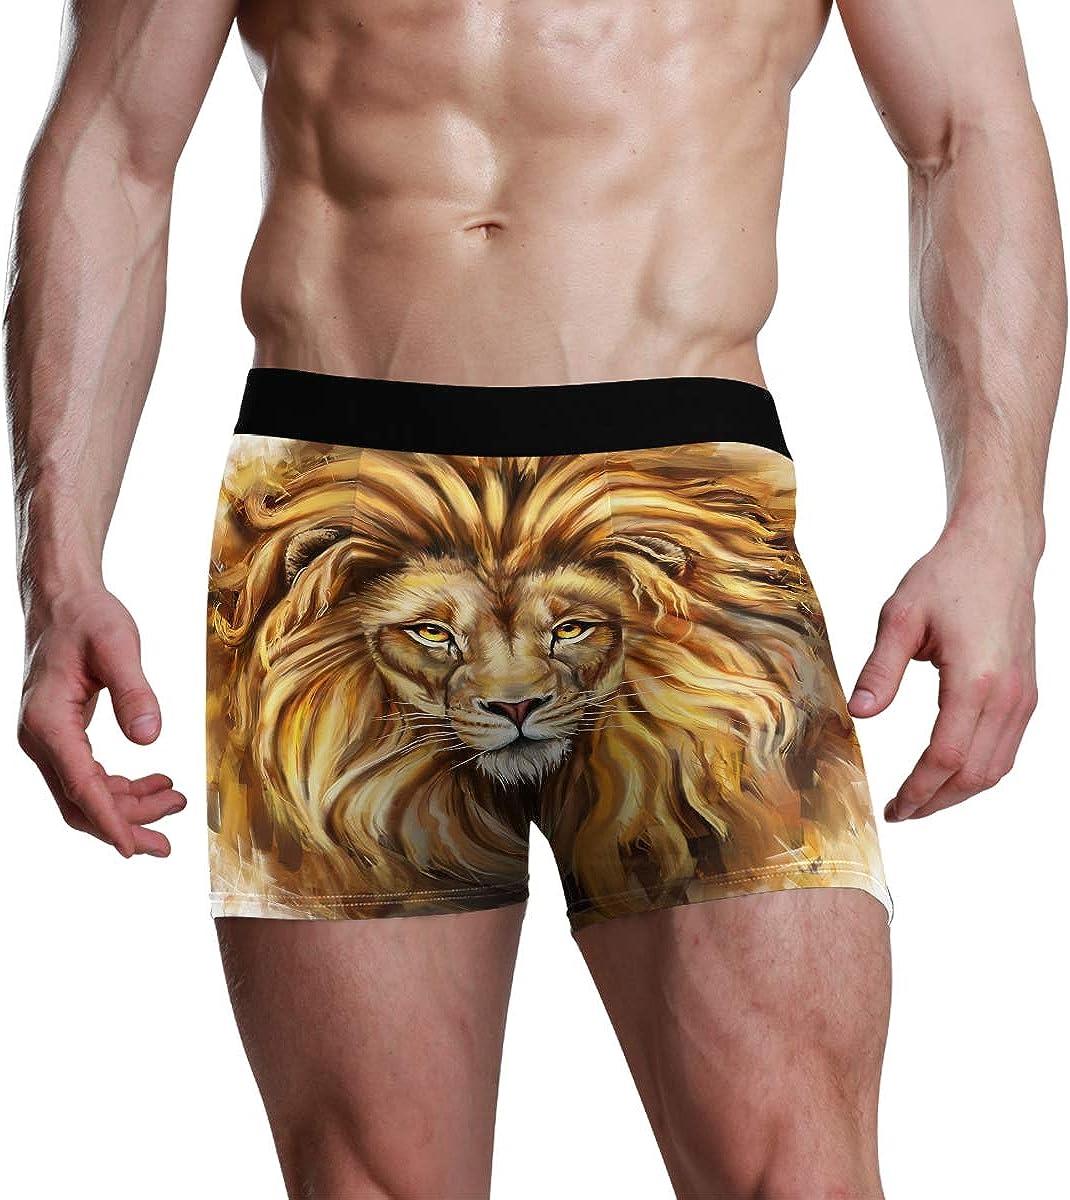 Mens Boxer Briefs Lion Digital Painting Custom Personalized Low Rise Trunks Underwear Breathable Bikini Boys